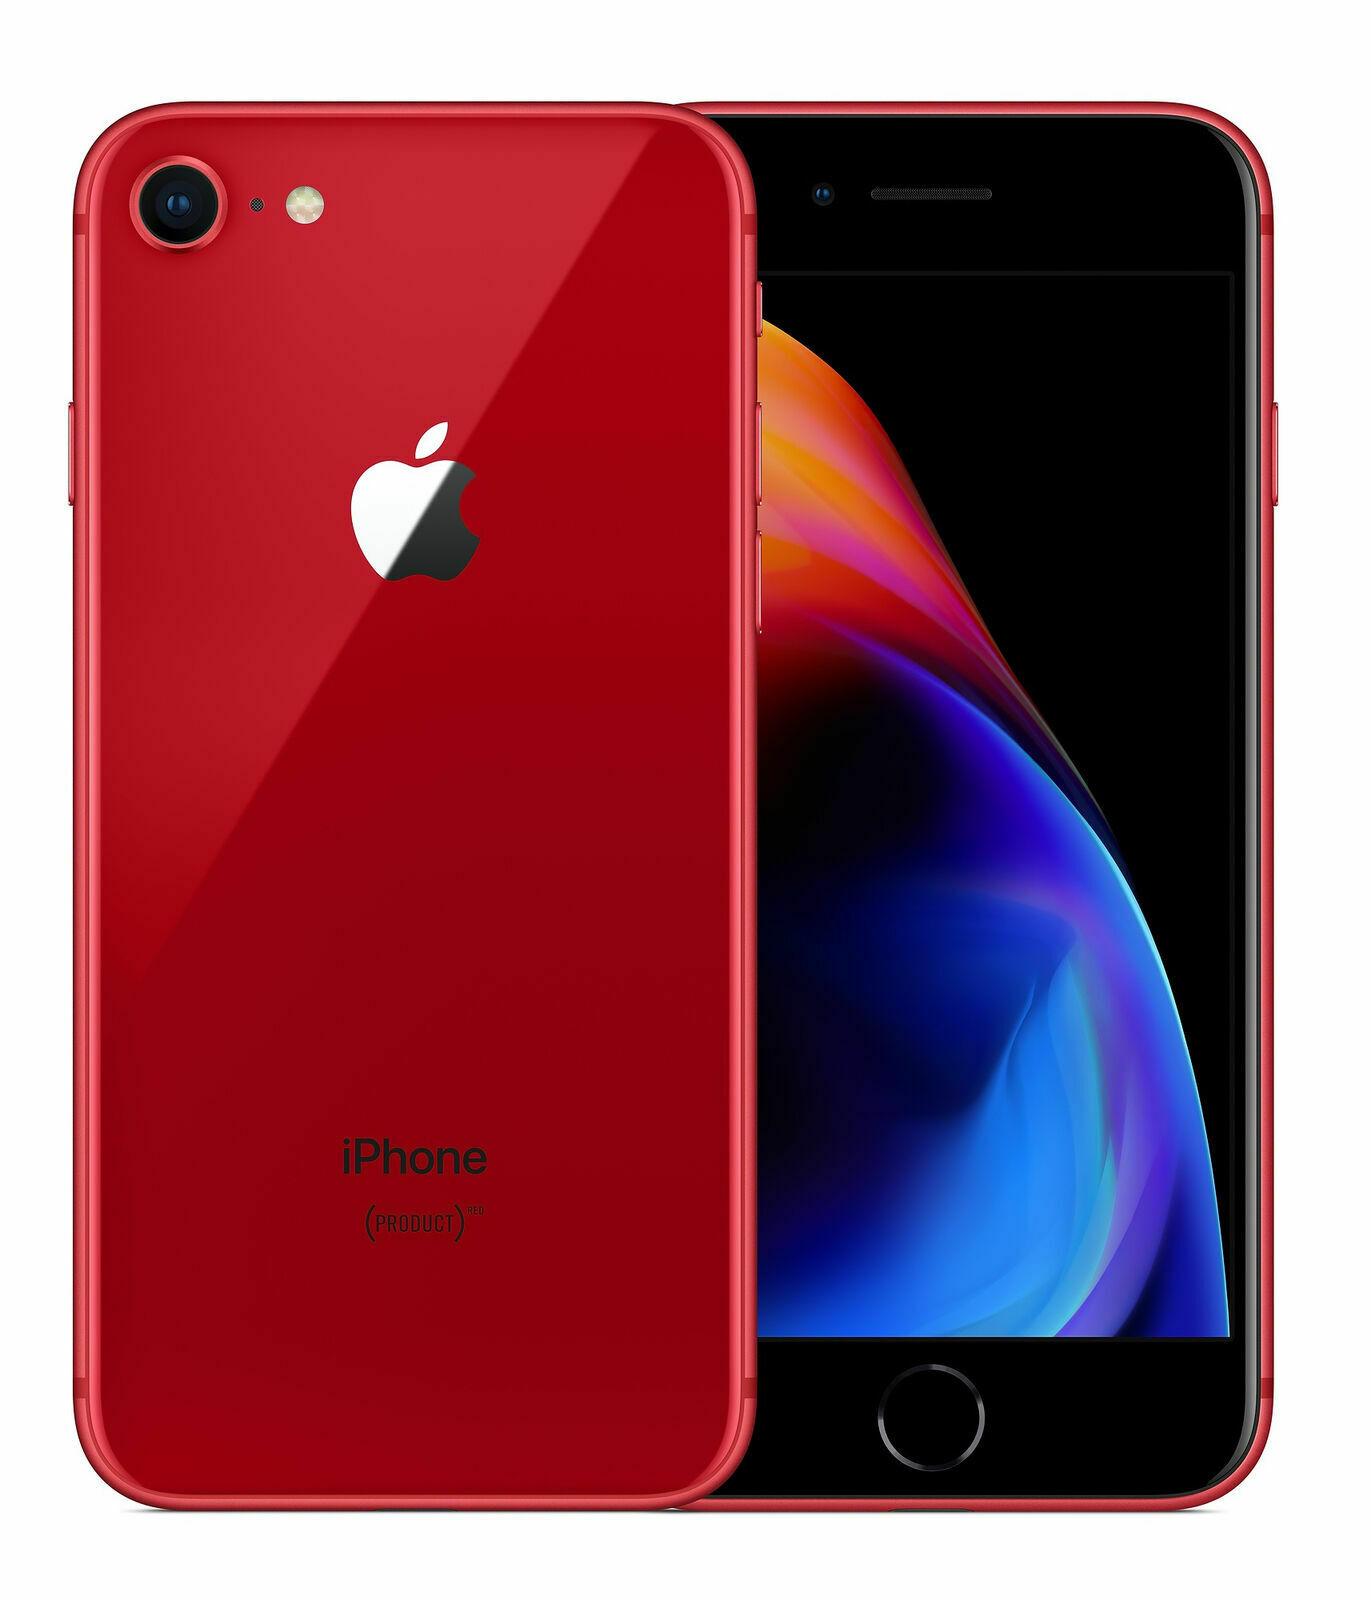 Iphone 8 Hintavertailu